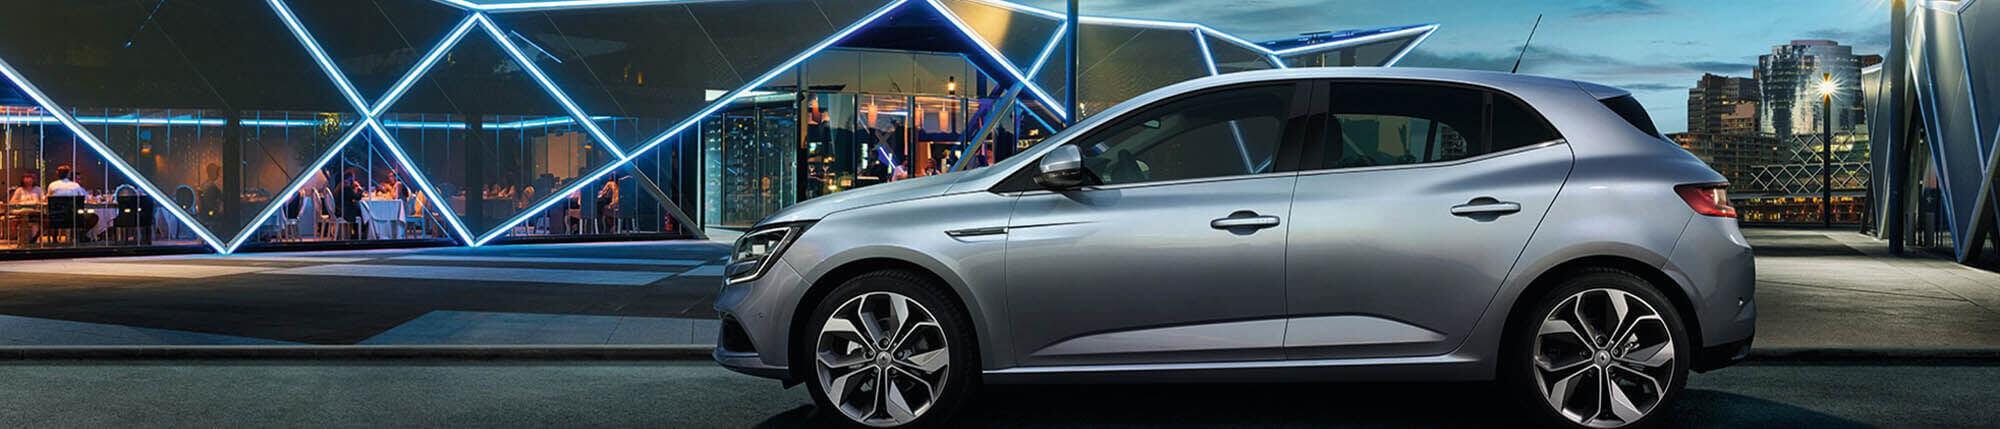 Garage Hyundai